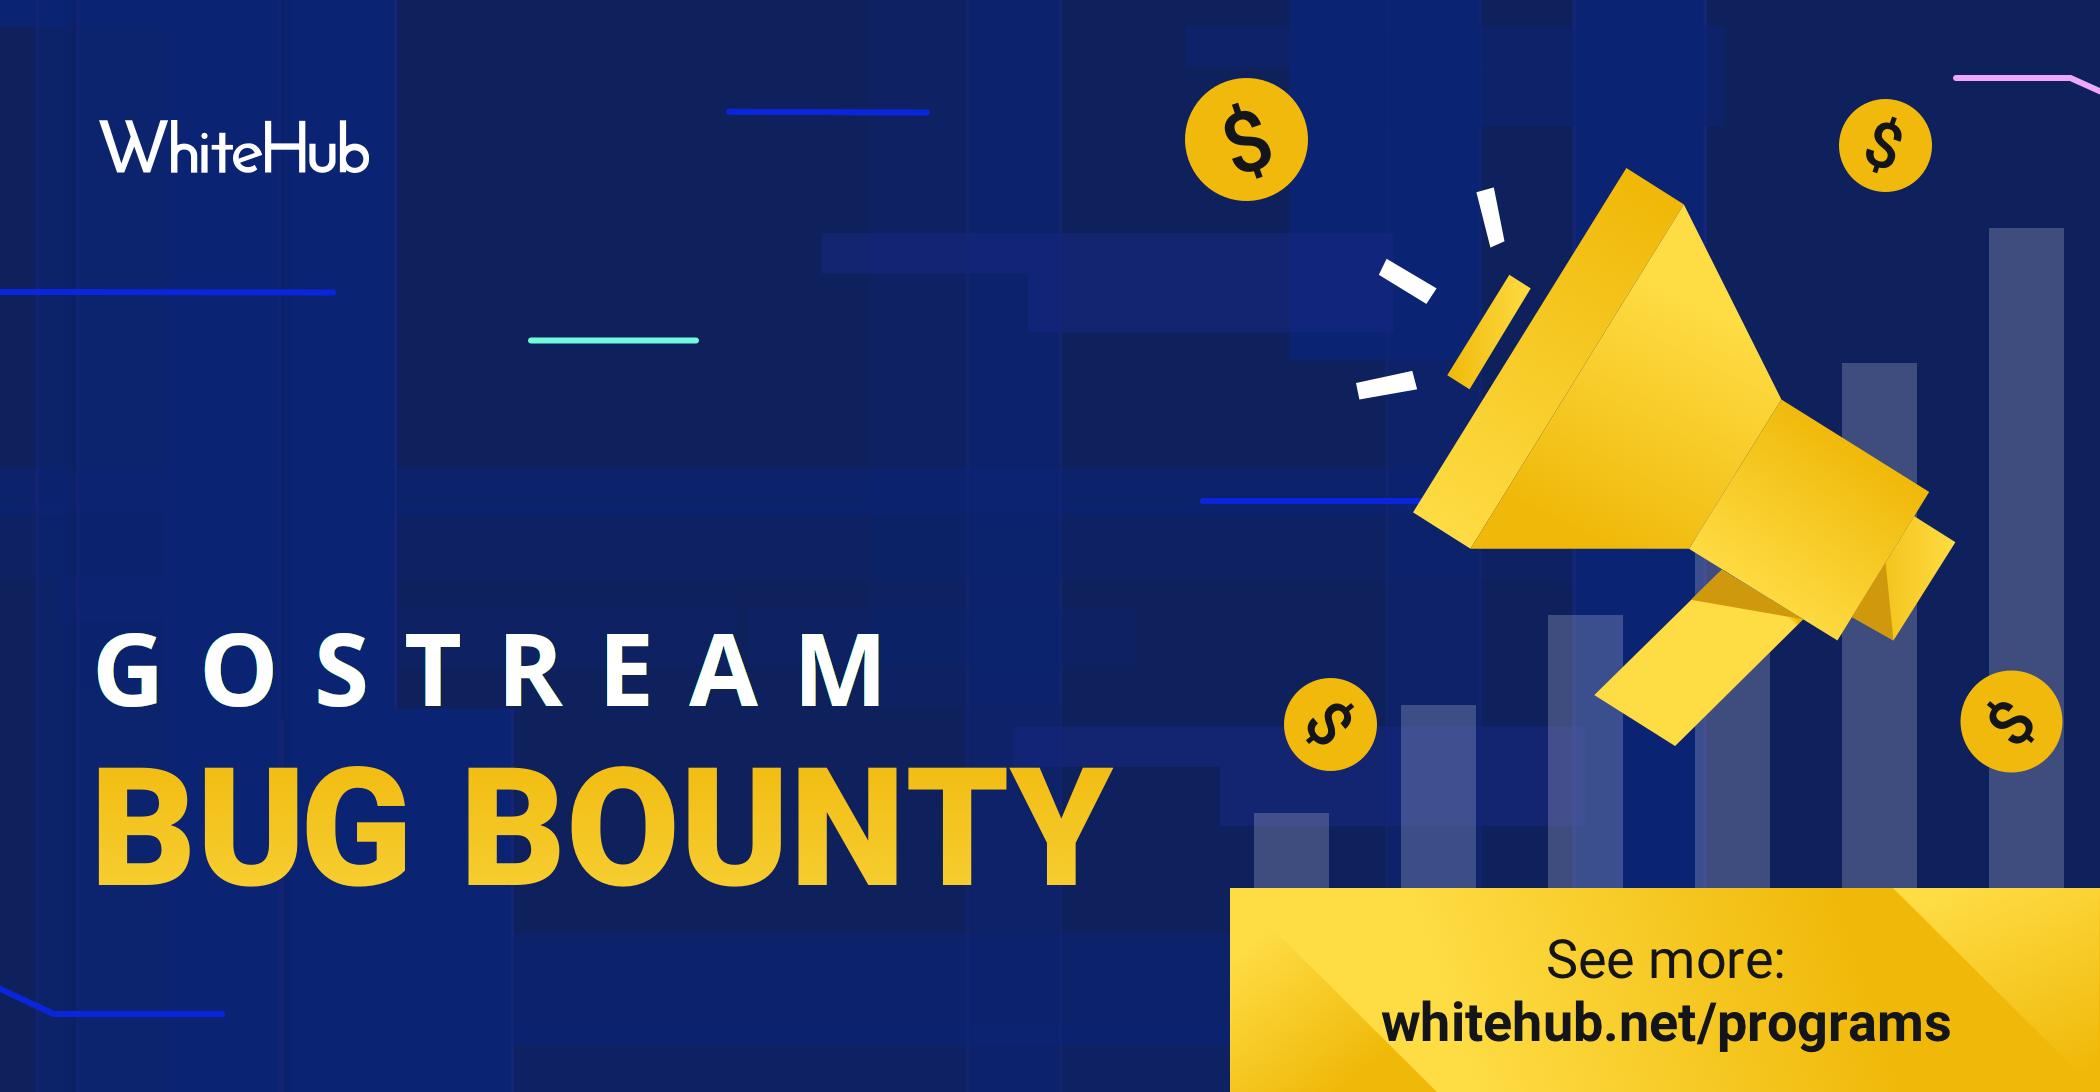 GoStream Bug Bounty Announced